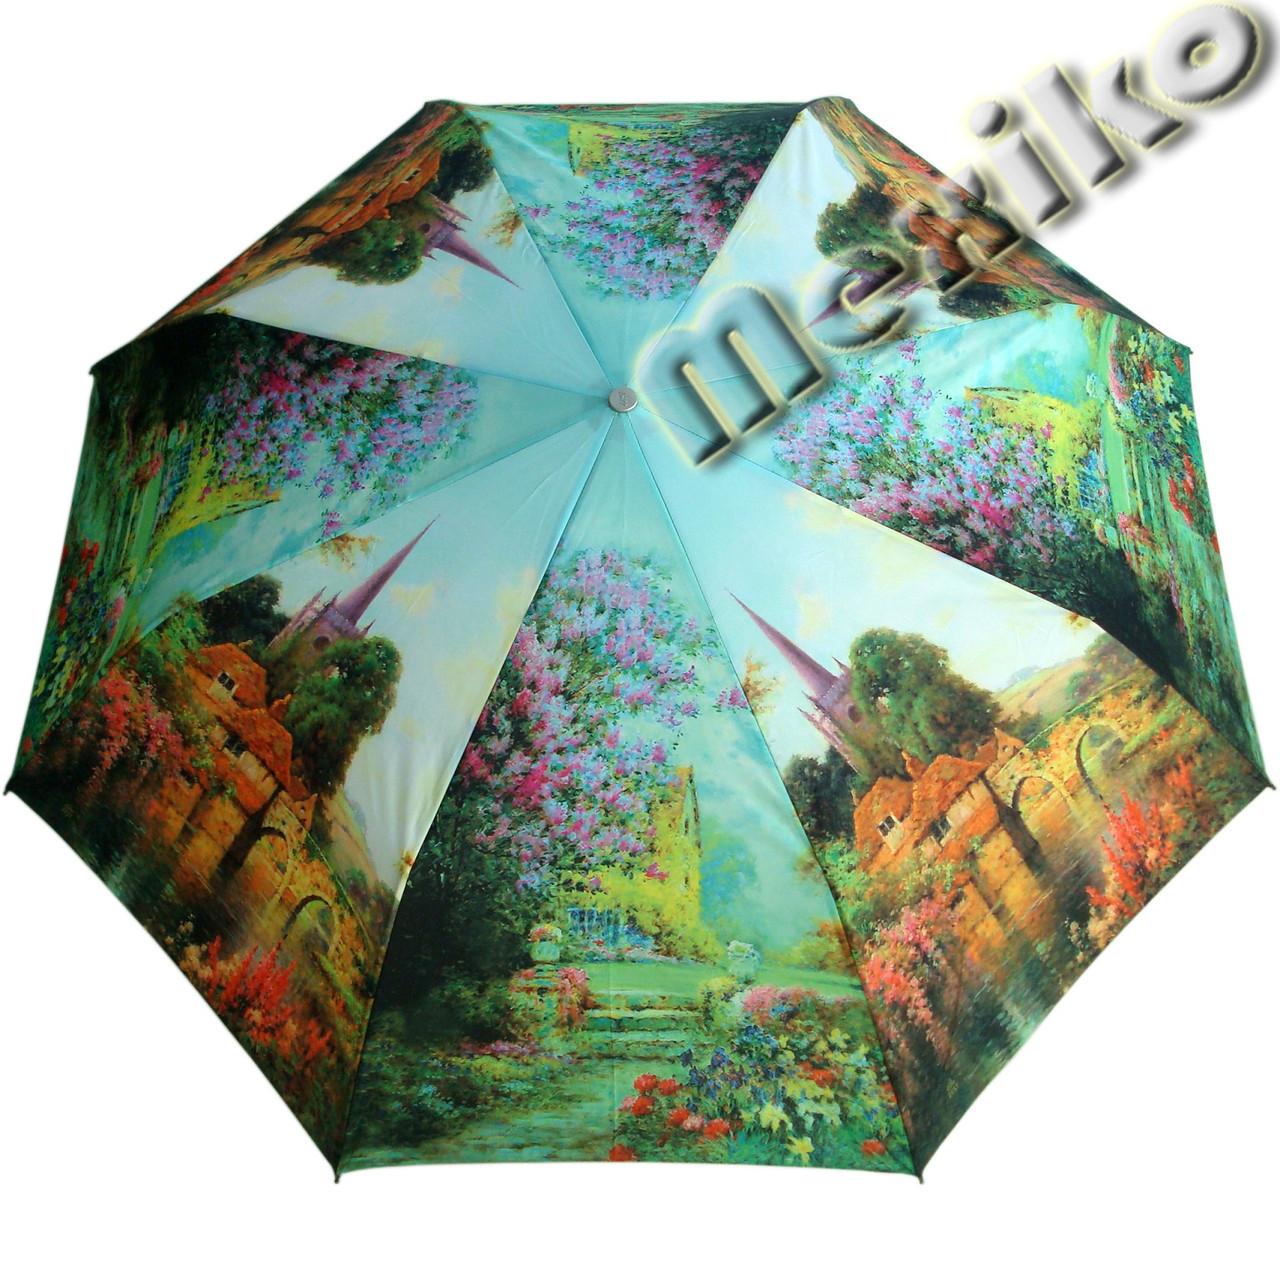 Зонт ZEST, полуавтомат серия Фото, расцветка Замок  в сирени